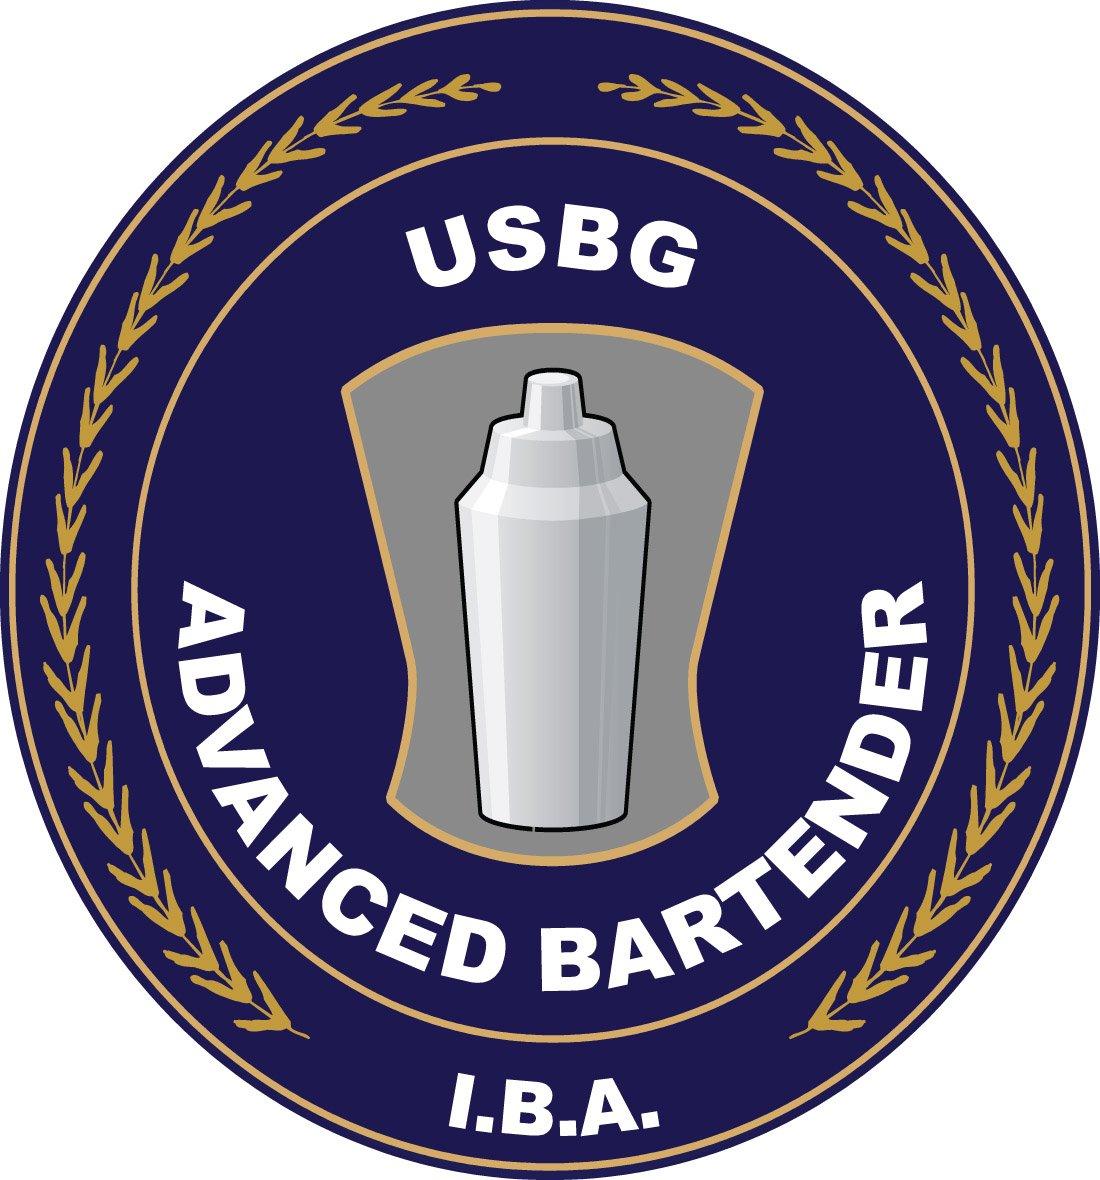 USBG Advanced Bartender